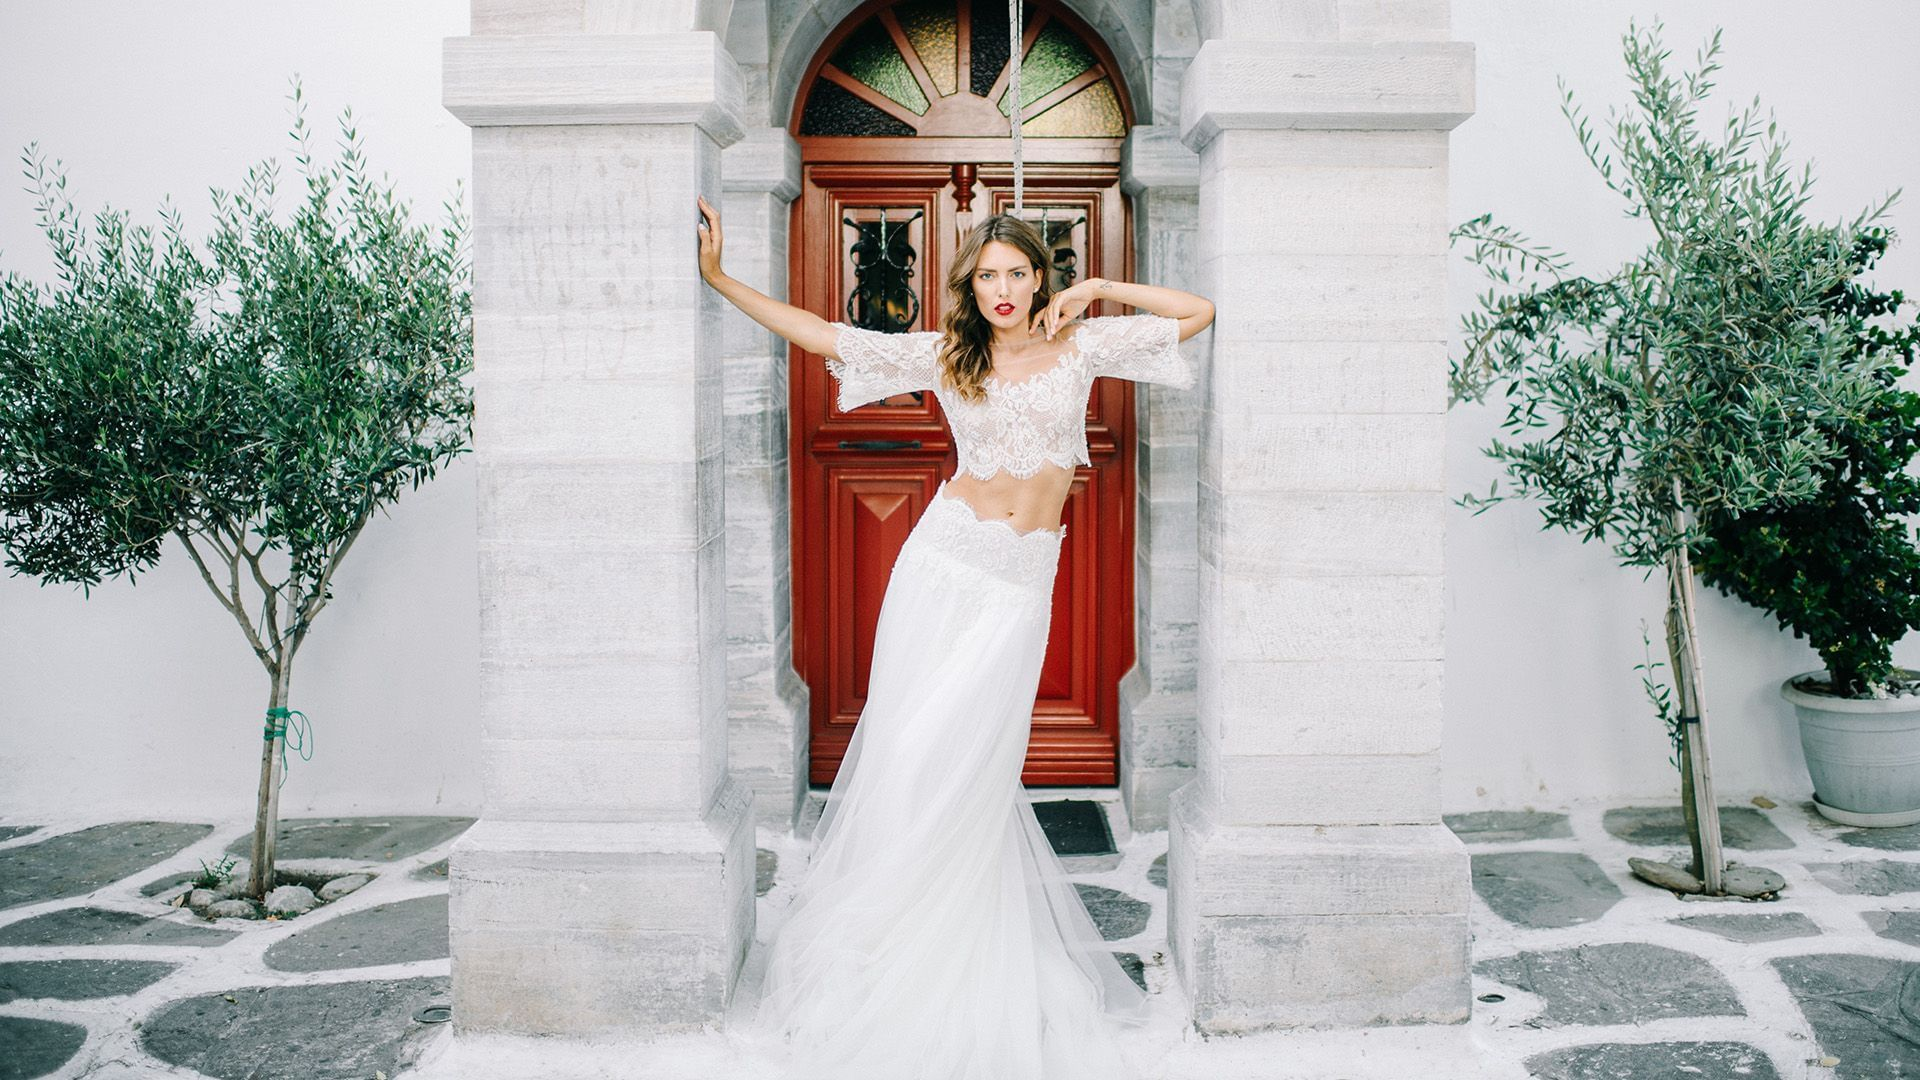 Eni Angelique - Bridal Designer